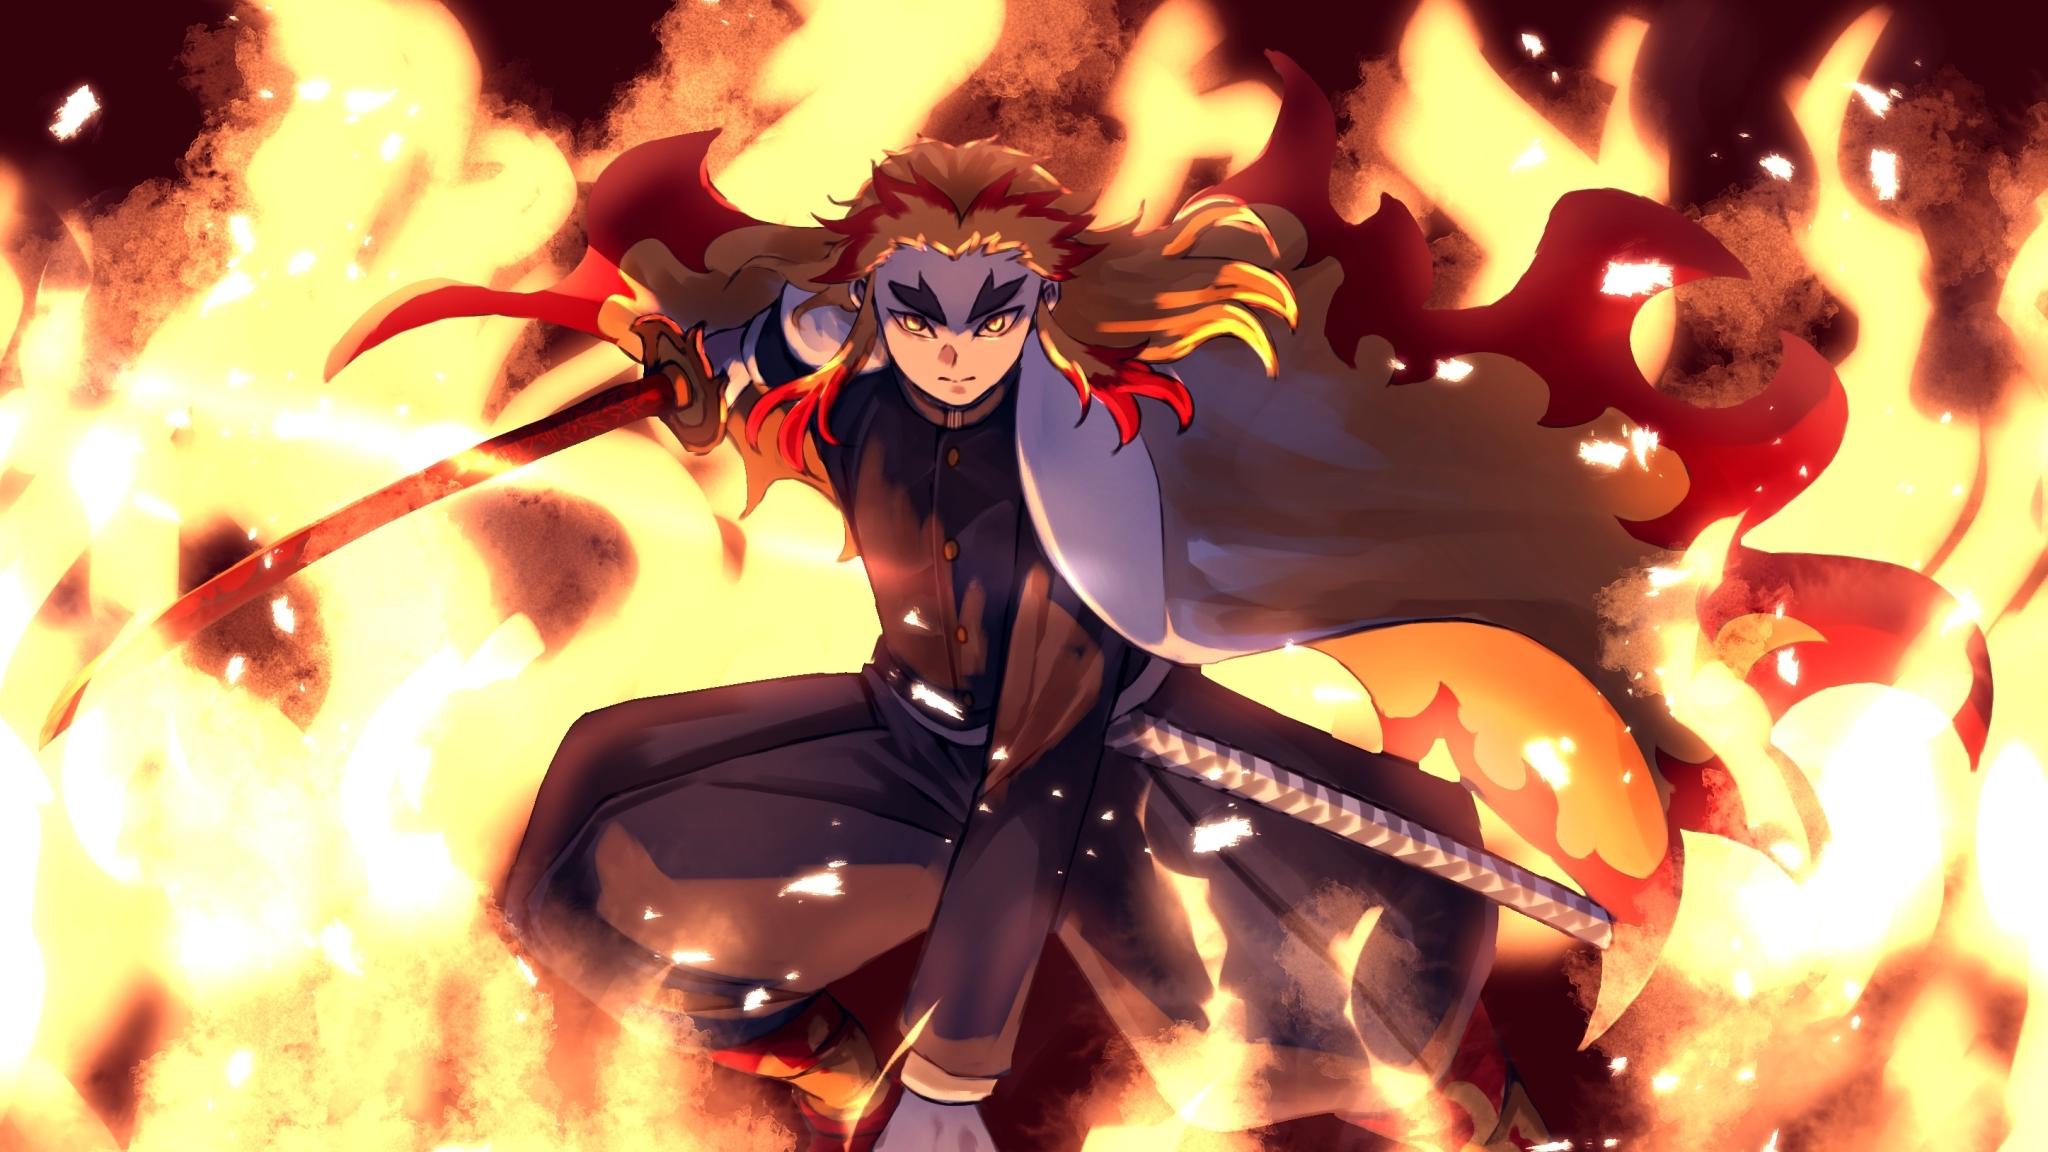 2048x1152 Kyojuro Rengoku From Demon Slayer 2048x1152